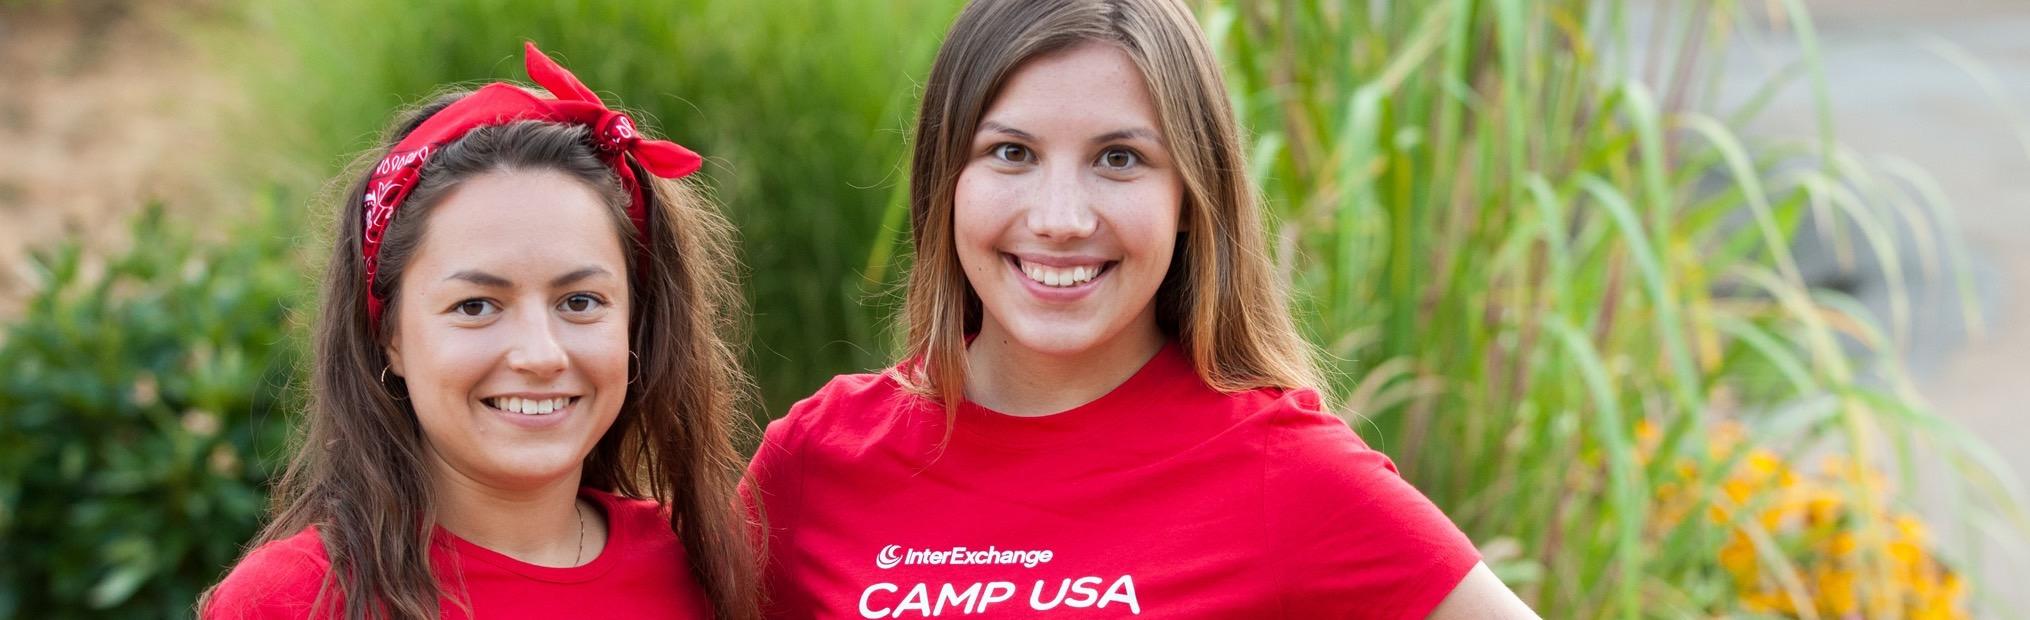 Host International Camp Support Staff